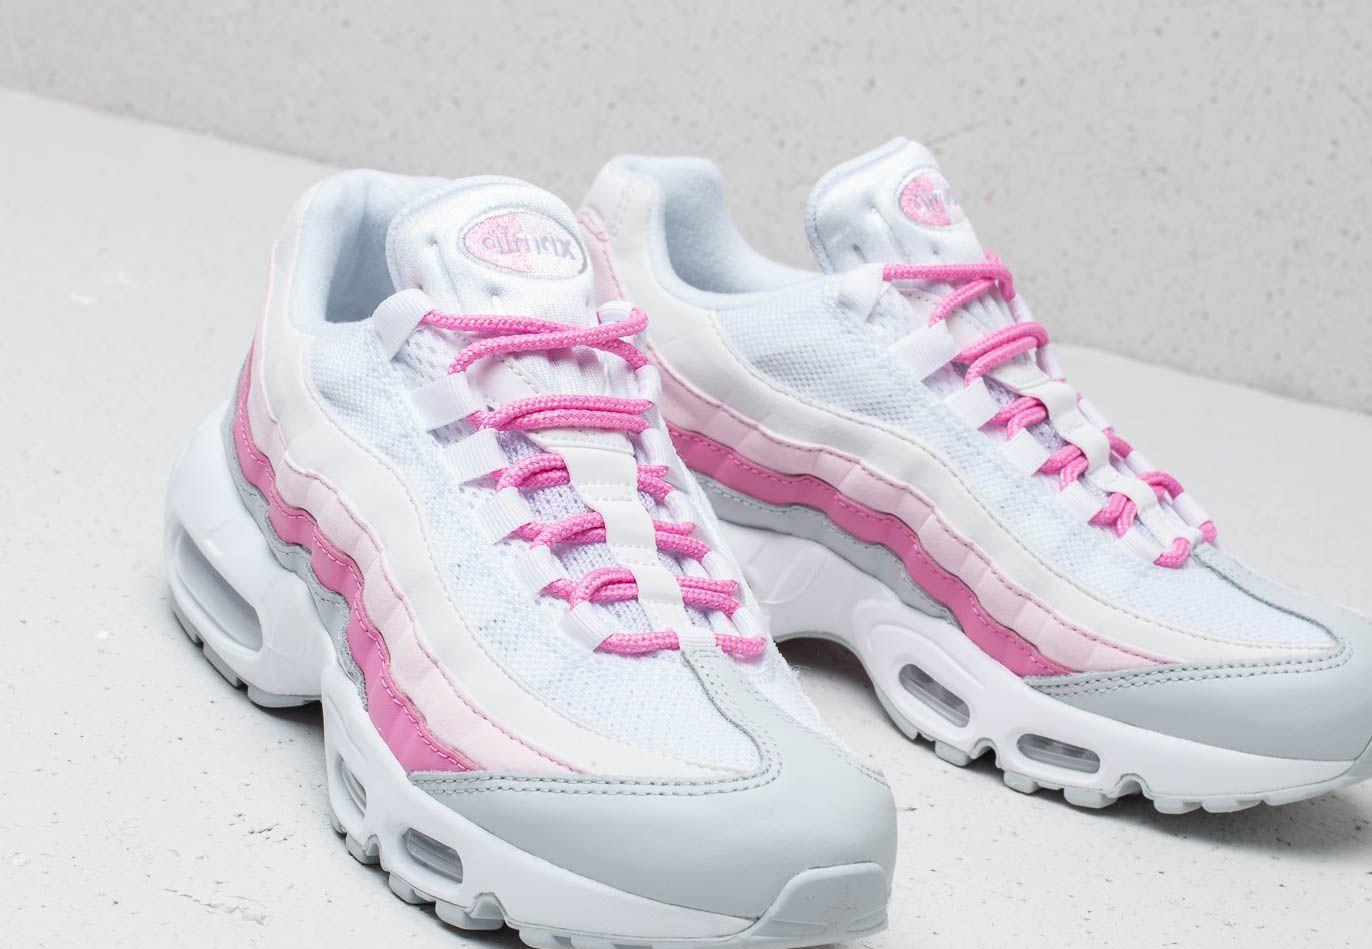 6487c7deb4 Nike W Air Max 95 Essential White/ White-psychic Pink-pure Platinum ...